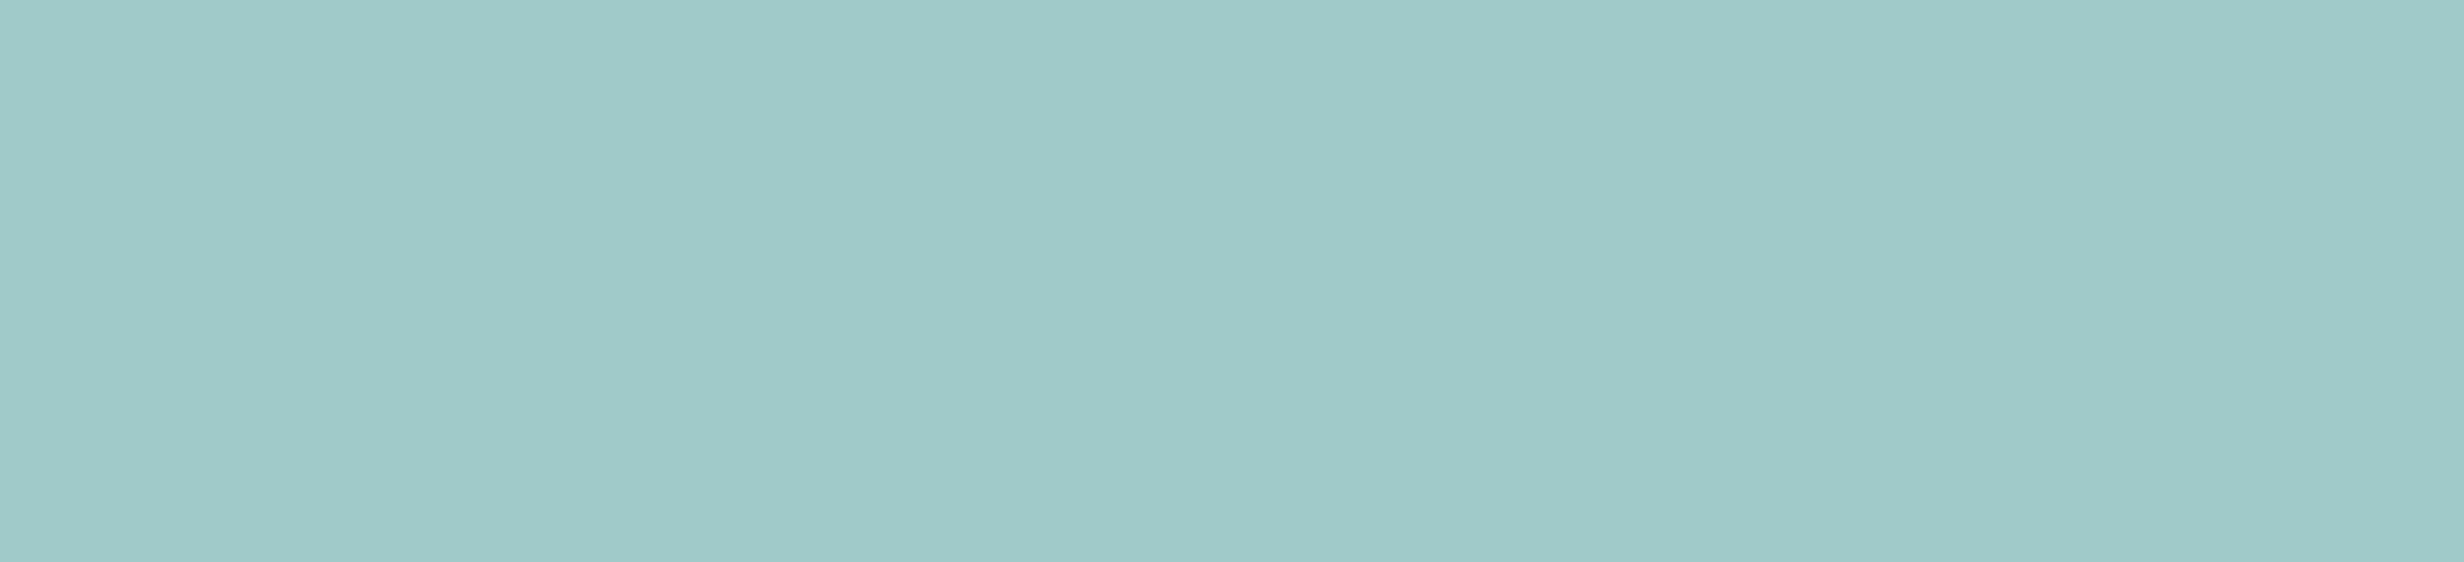 Hot Topic / My Process - DISCOVER ⟶ DEFINE ⟶ ARCHITECT ⟶ DESIGN